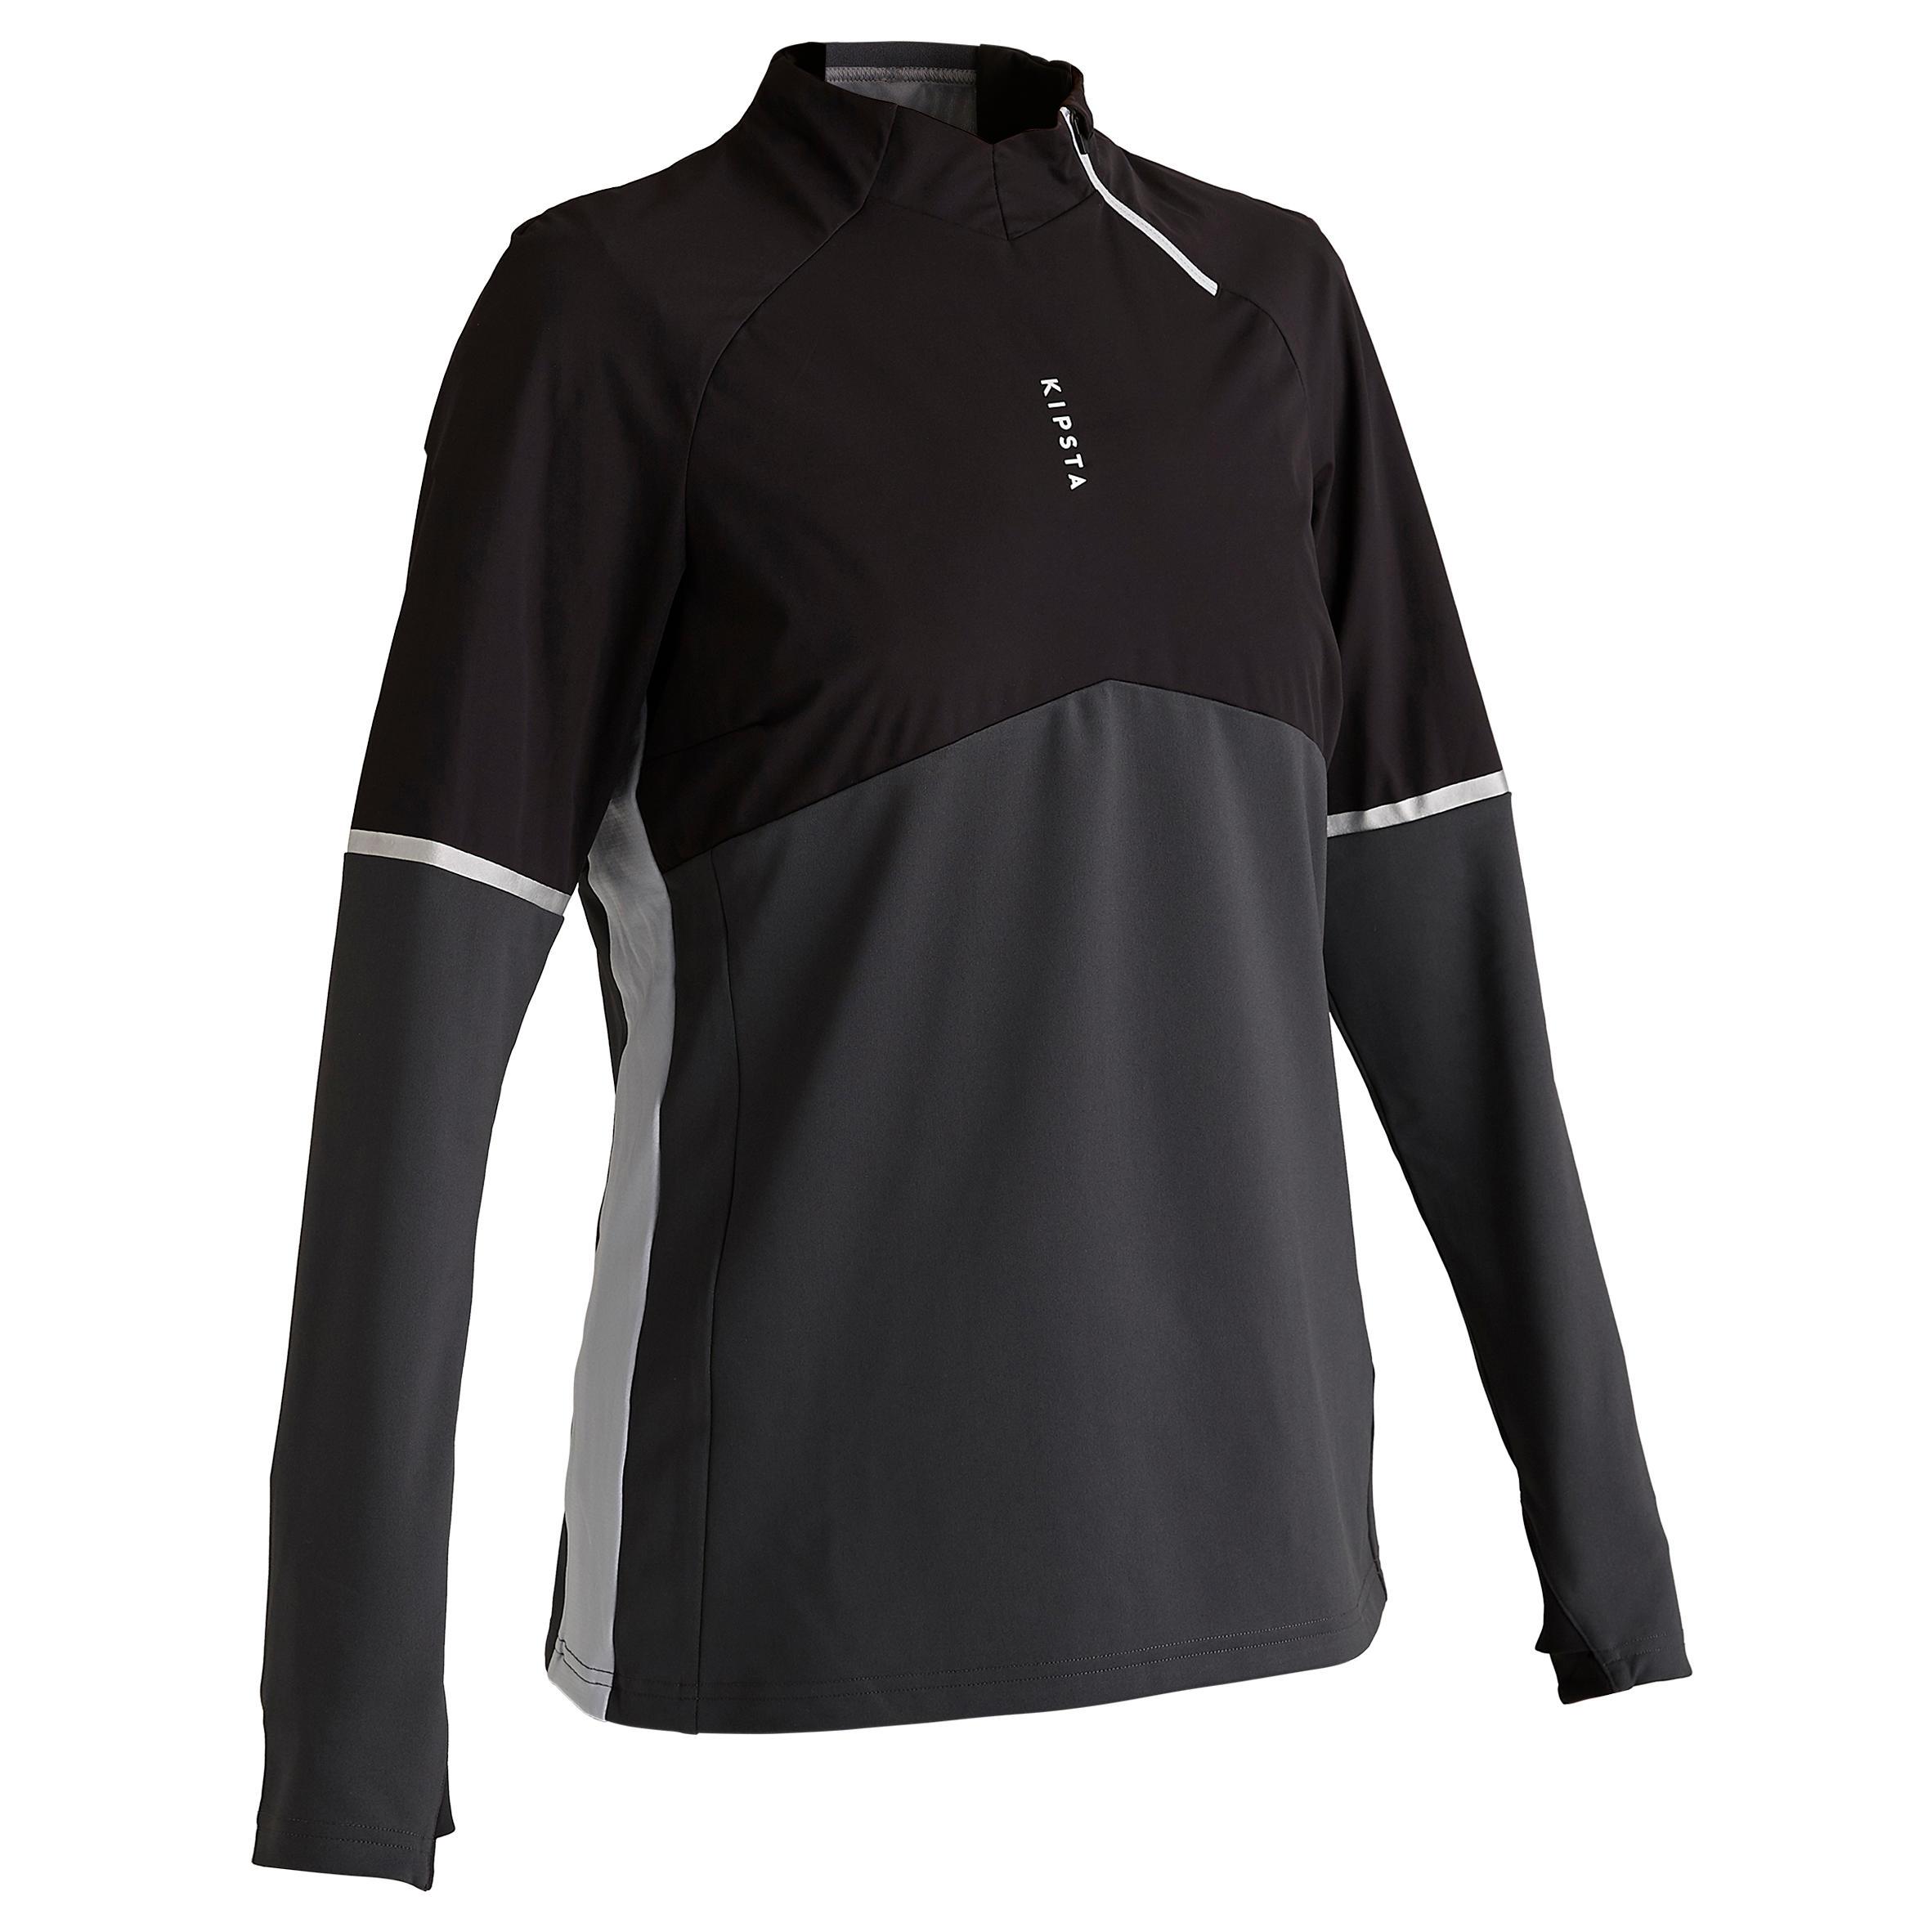 Sweatshirt Trainingsshirt Fussball T500 Damen schwarz